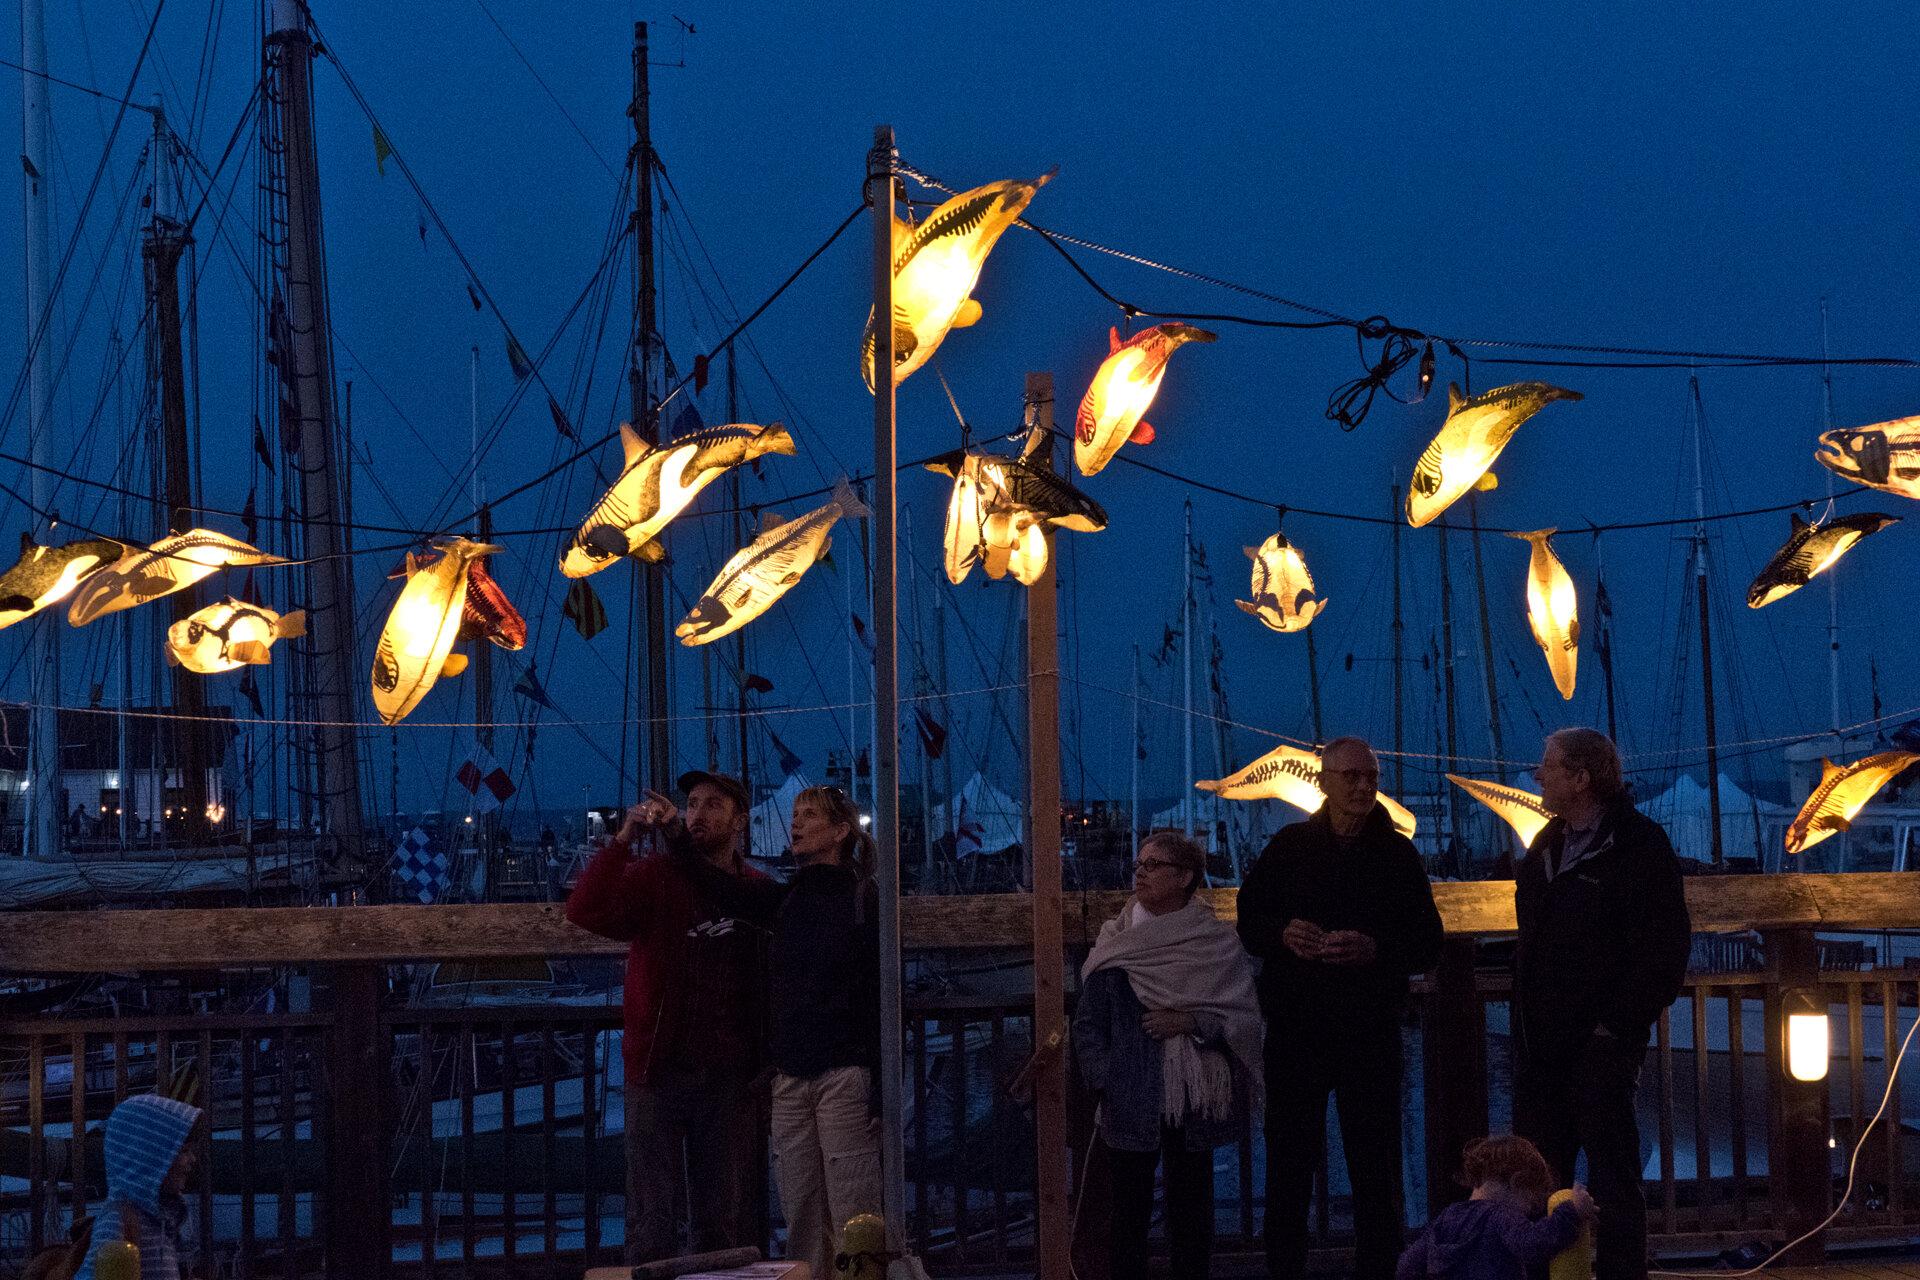 Outdoor installation at Wooden Boat Festival